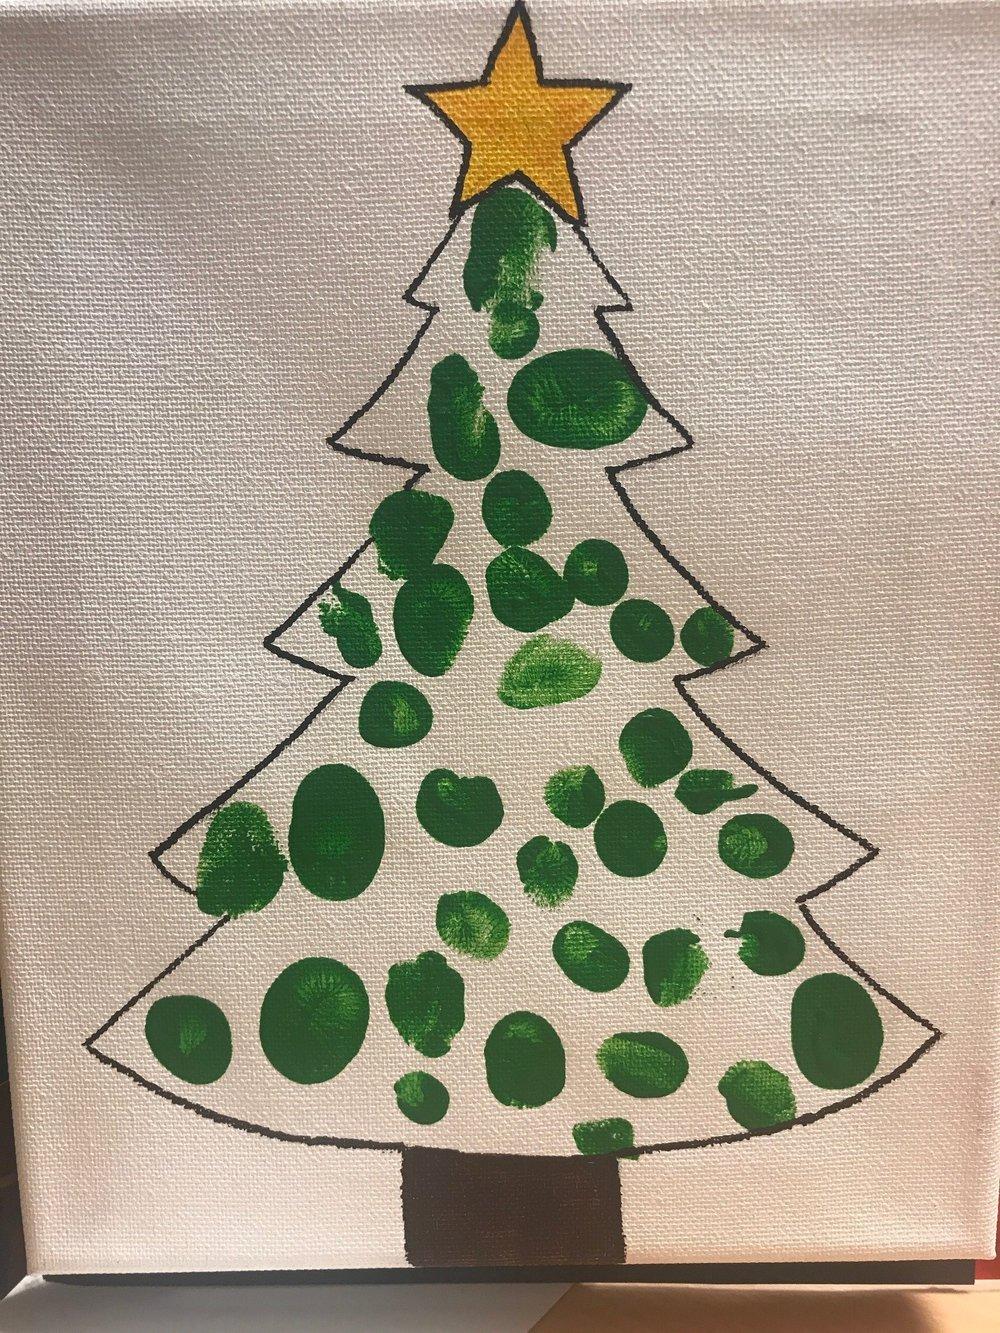 x mas tree with fingerprints.jpg